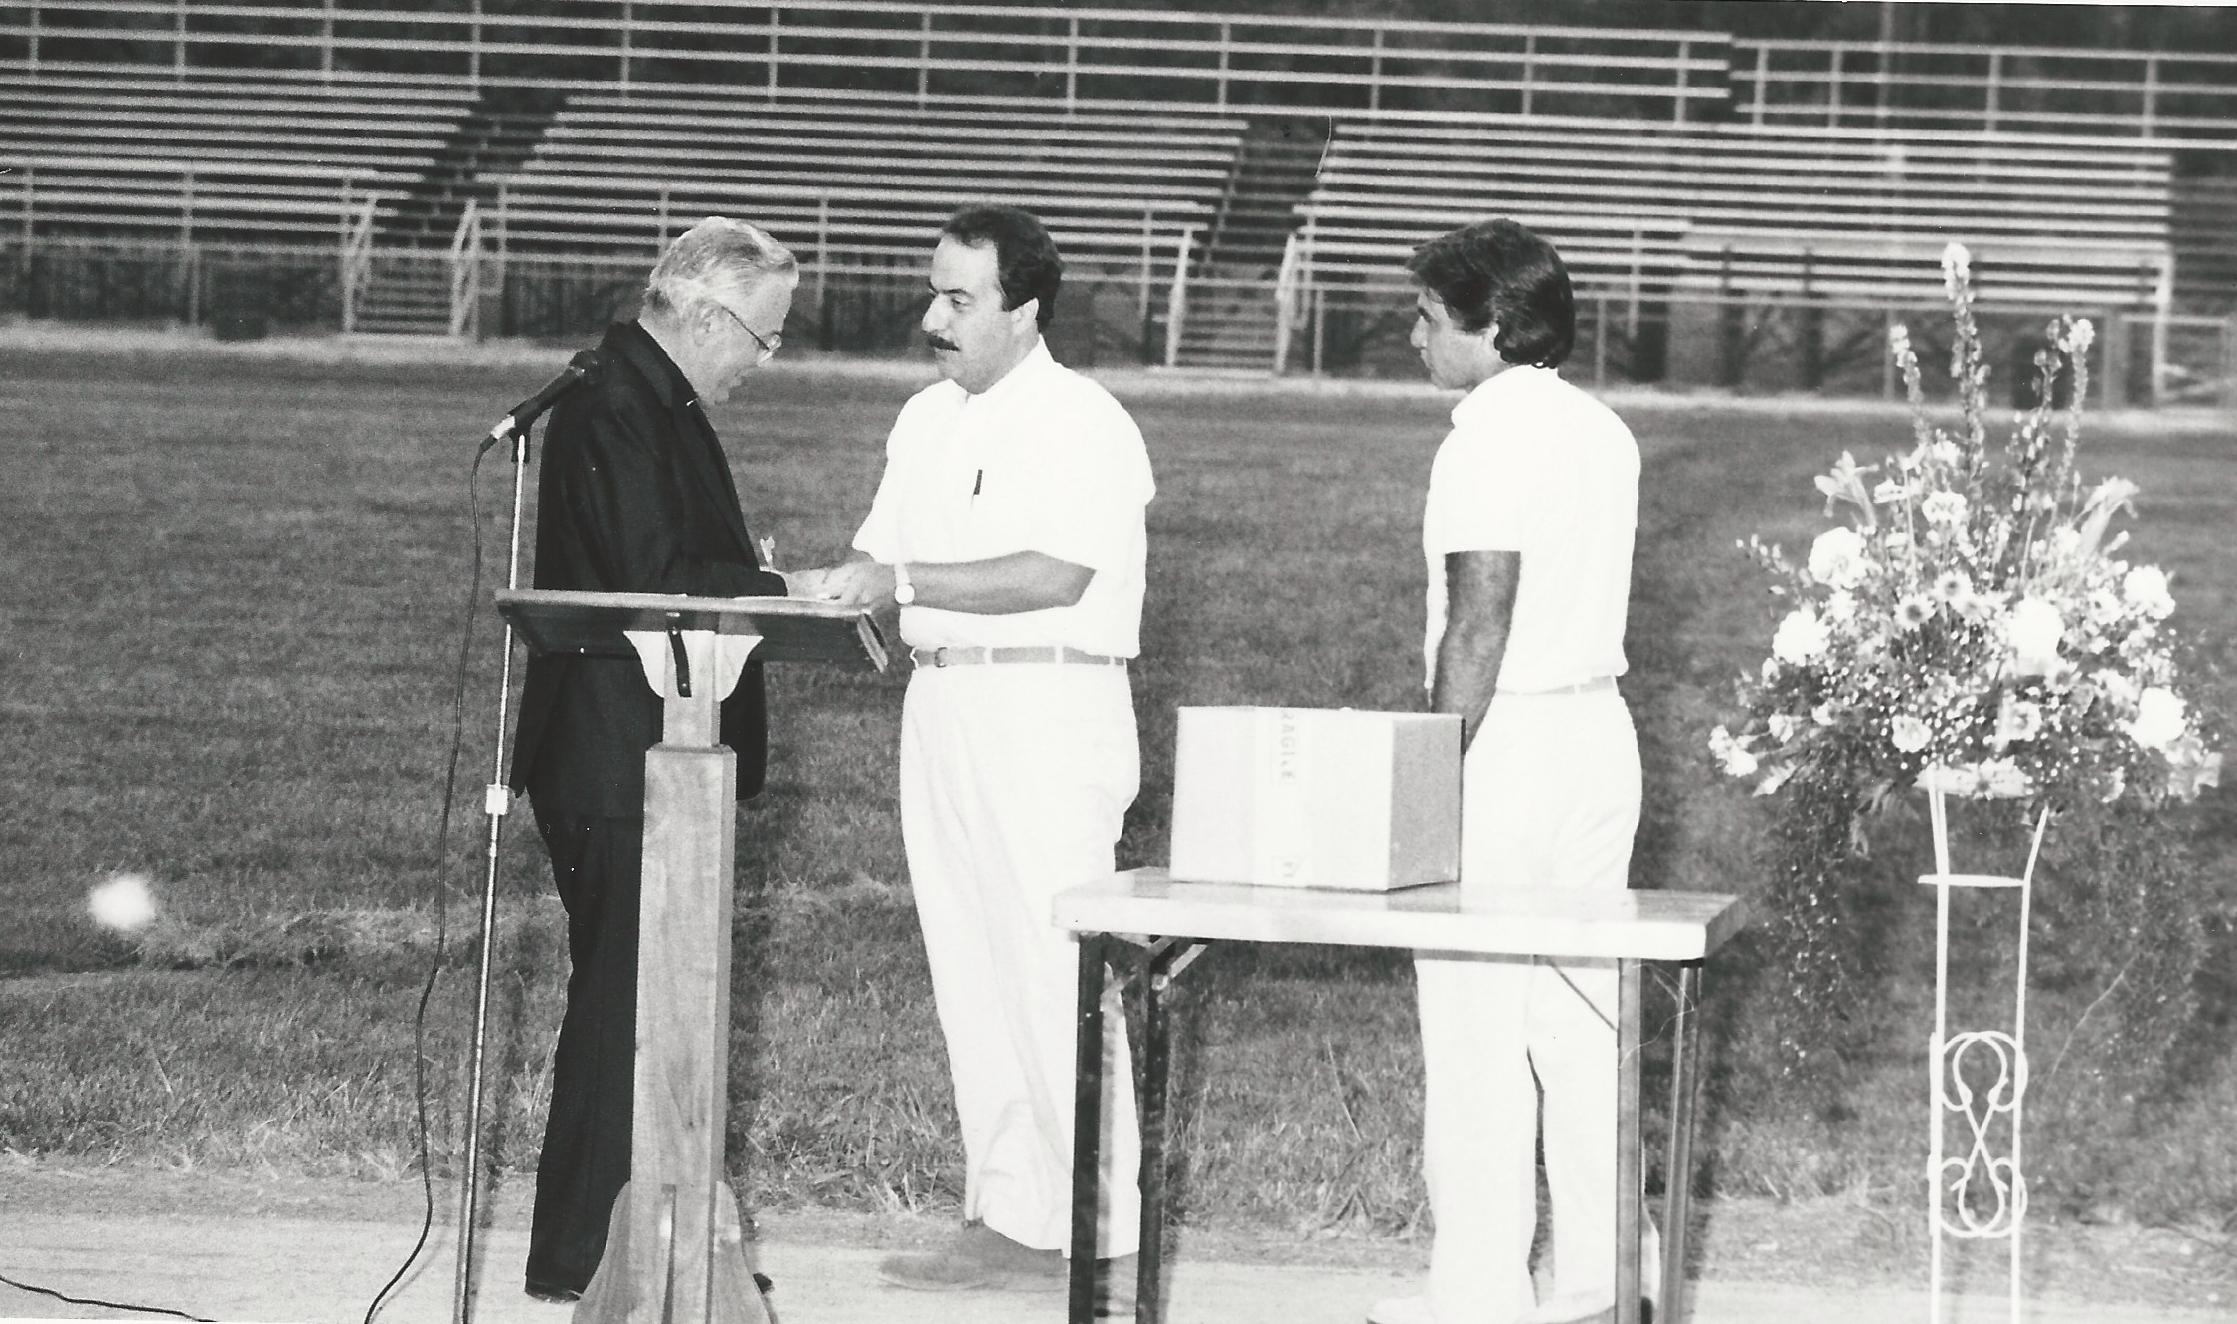 Former principal Msgr. James Berendt, principal Pat Rossetti and Athletic Director Bob Triano